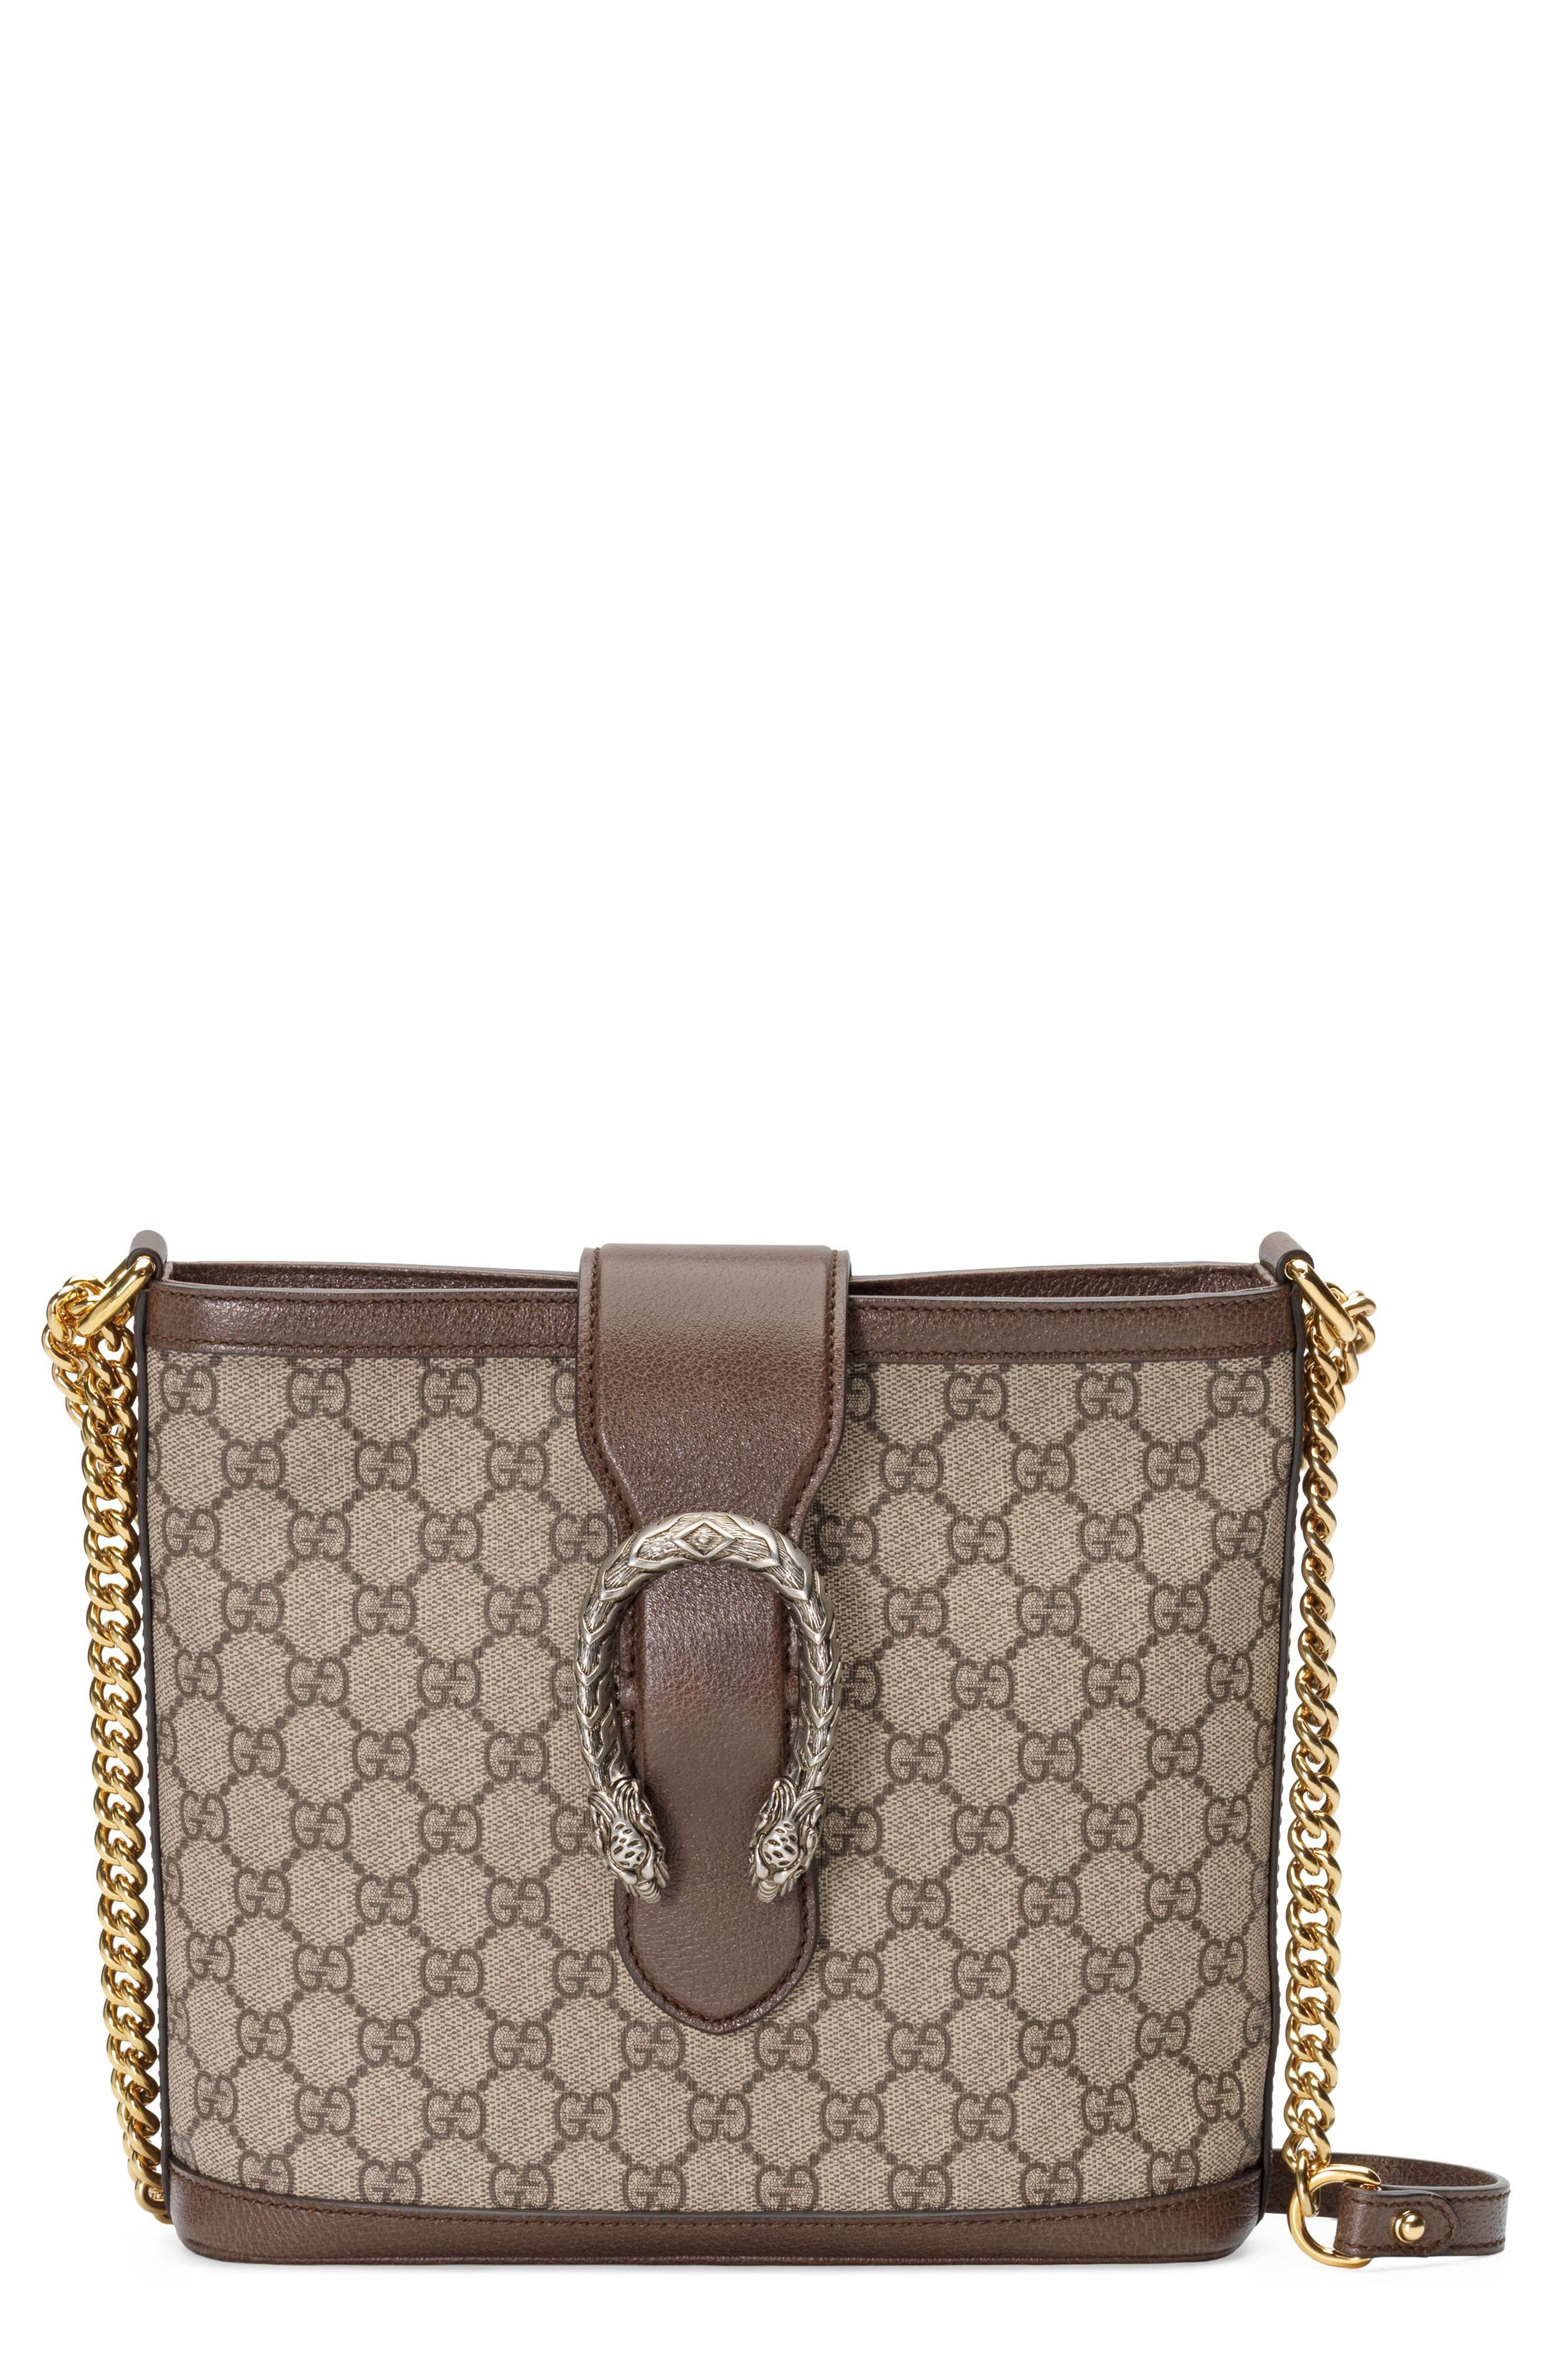 e2b1b9f259d Gucci Dionysus Medium Gg Supreme Canvas Bucket Bag In Brown